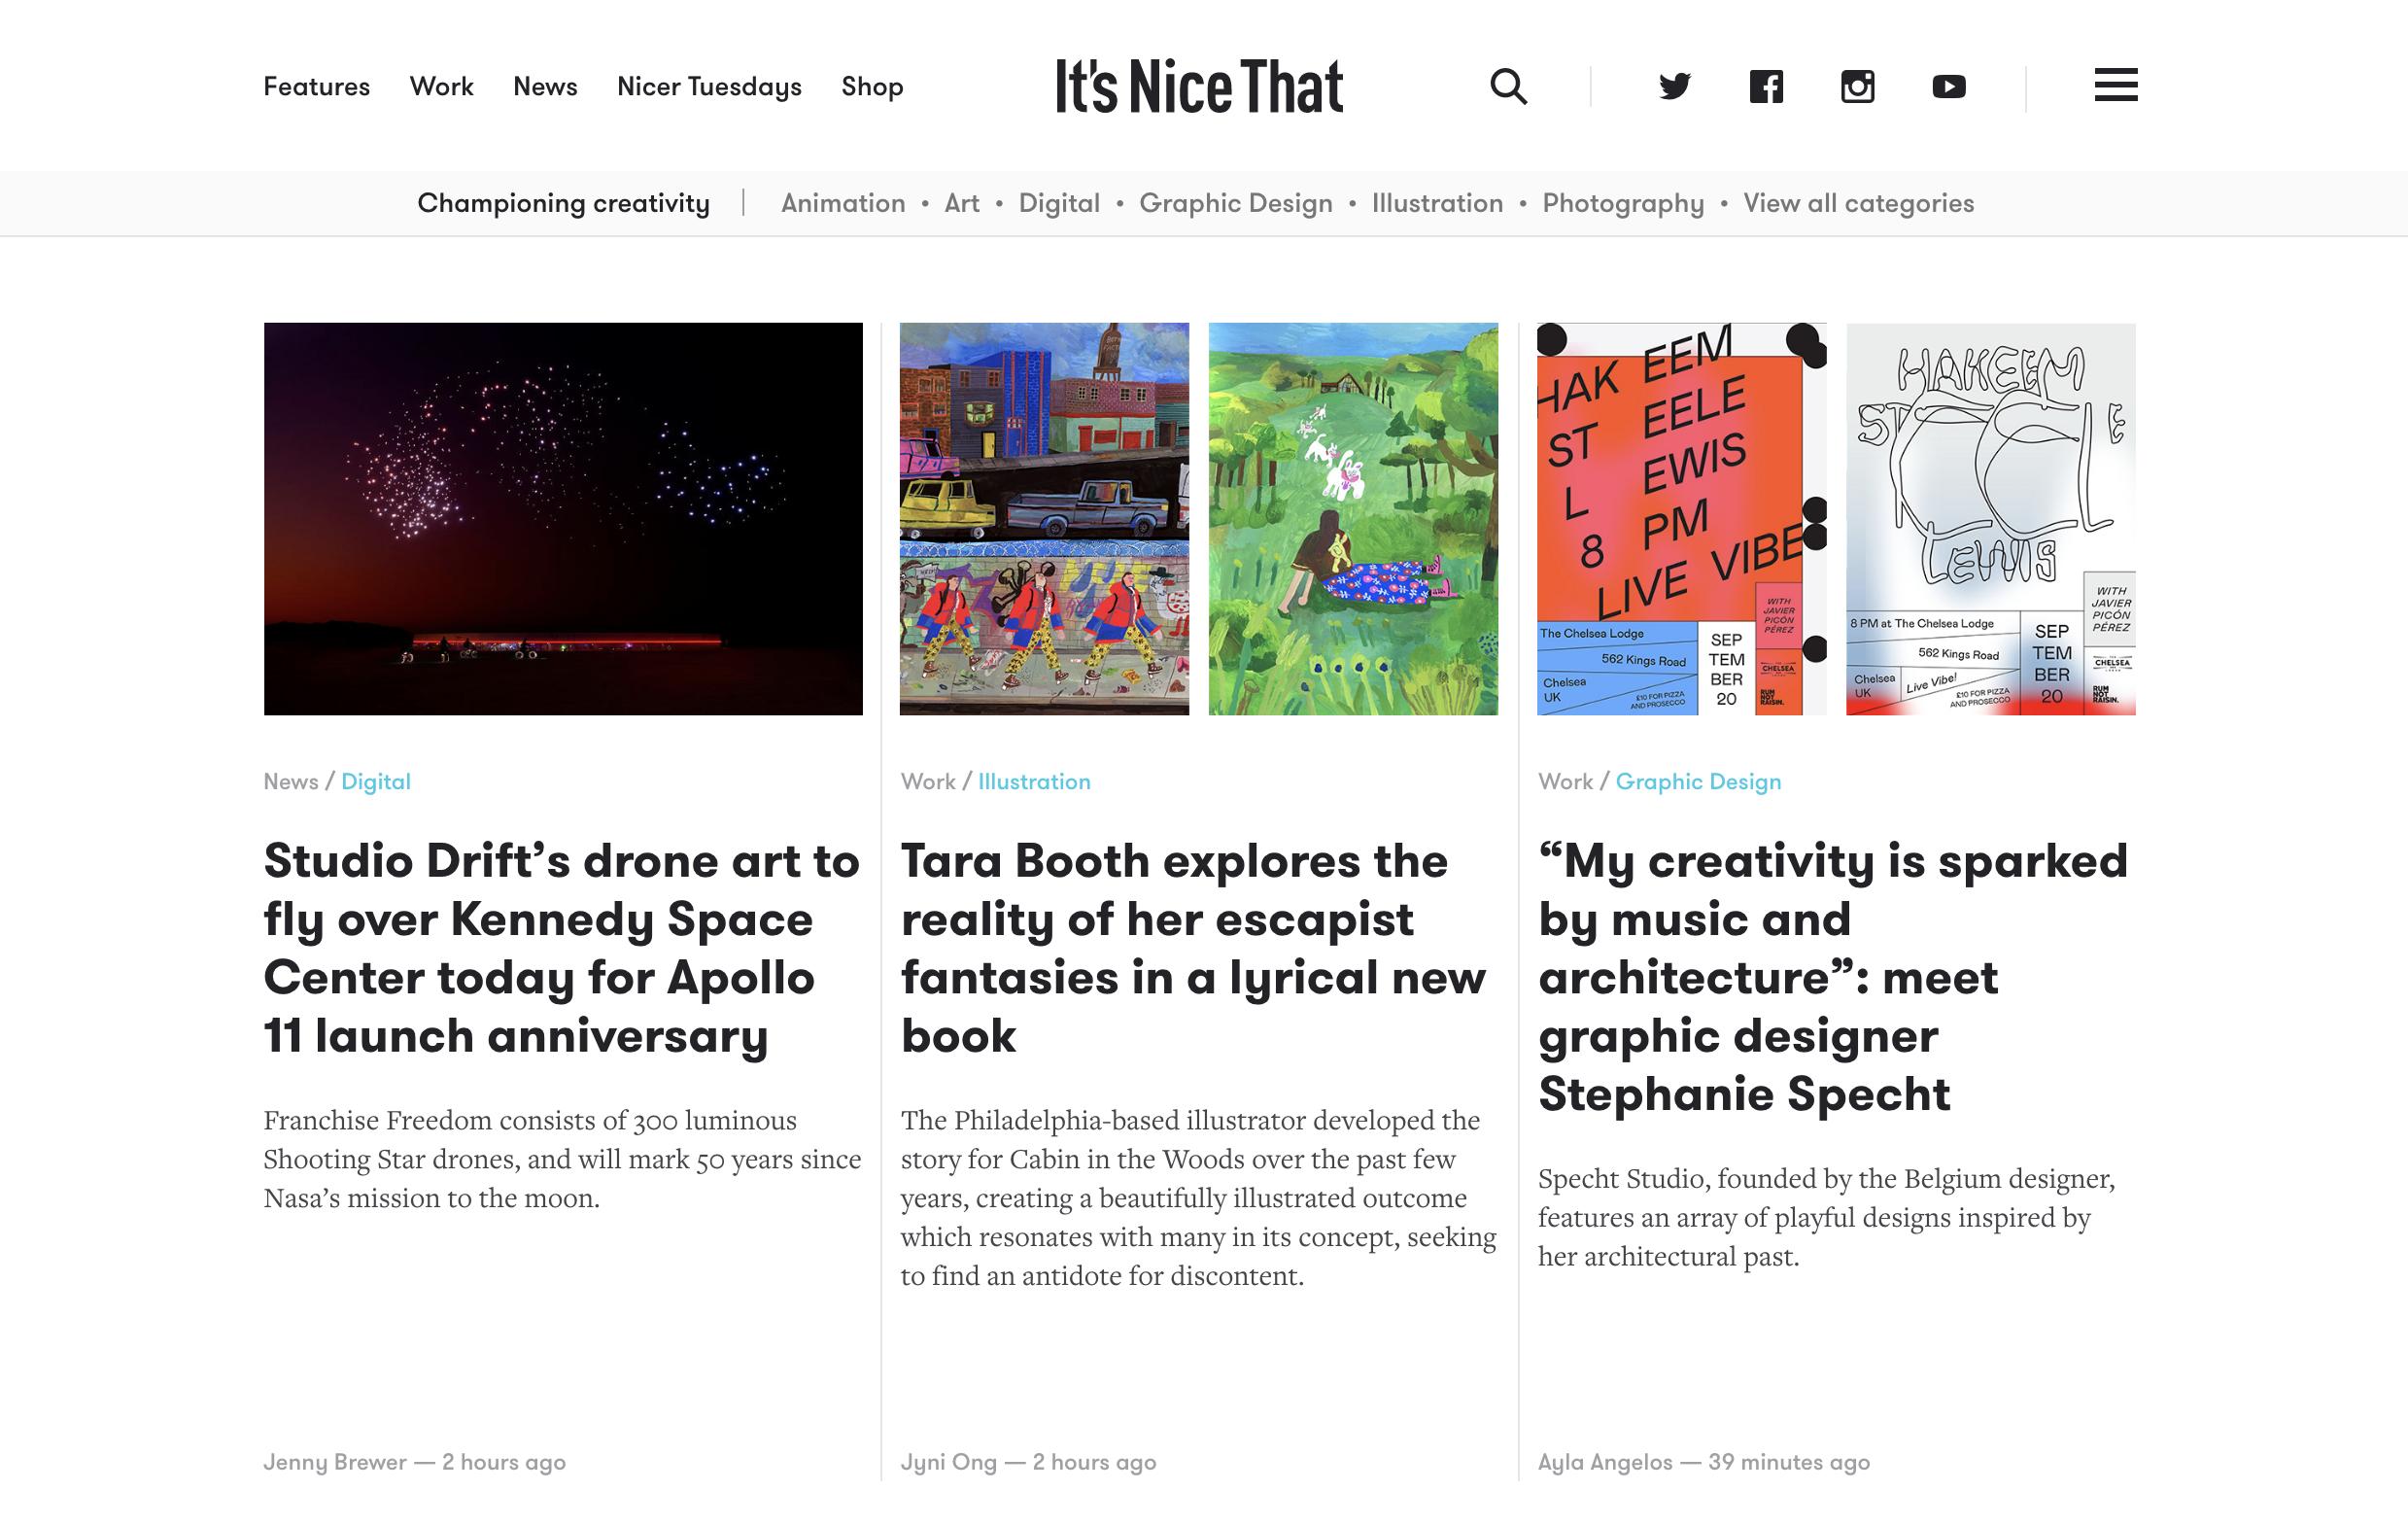 https://www.itsnicethat.com/articles/specht-studio-graphic-design-160719